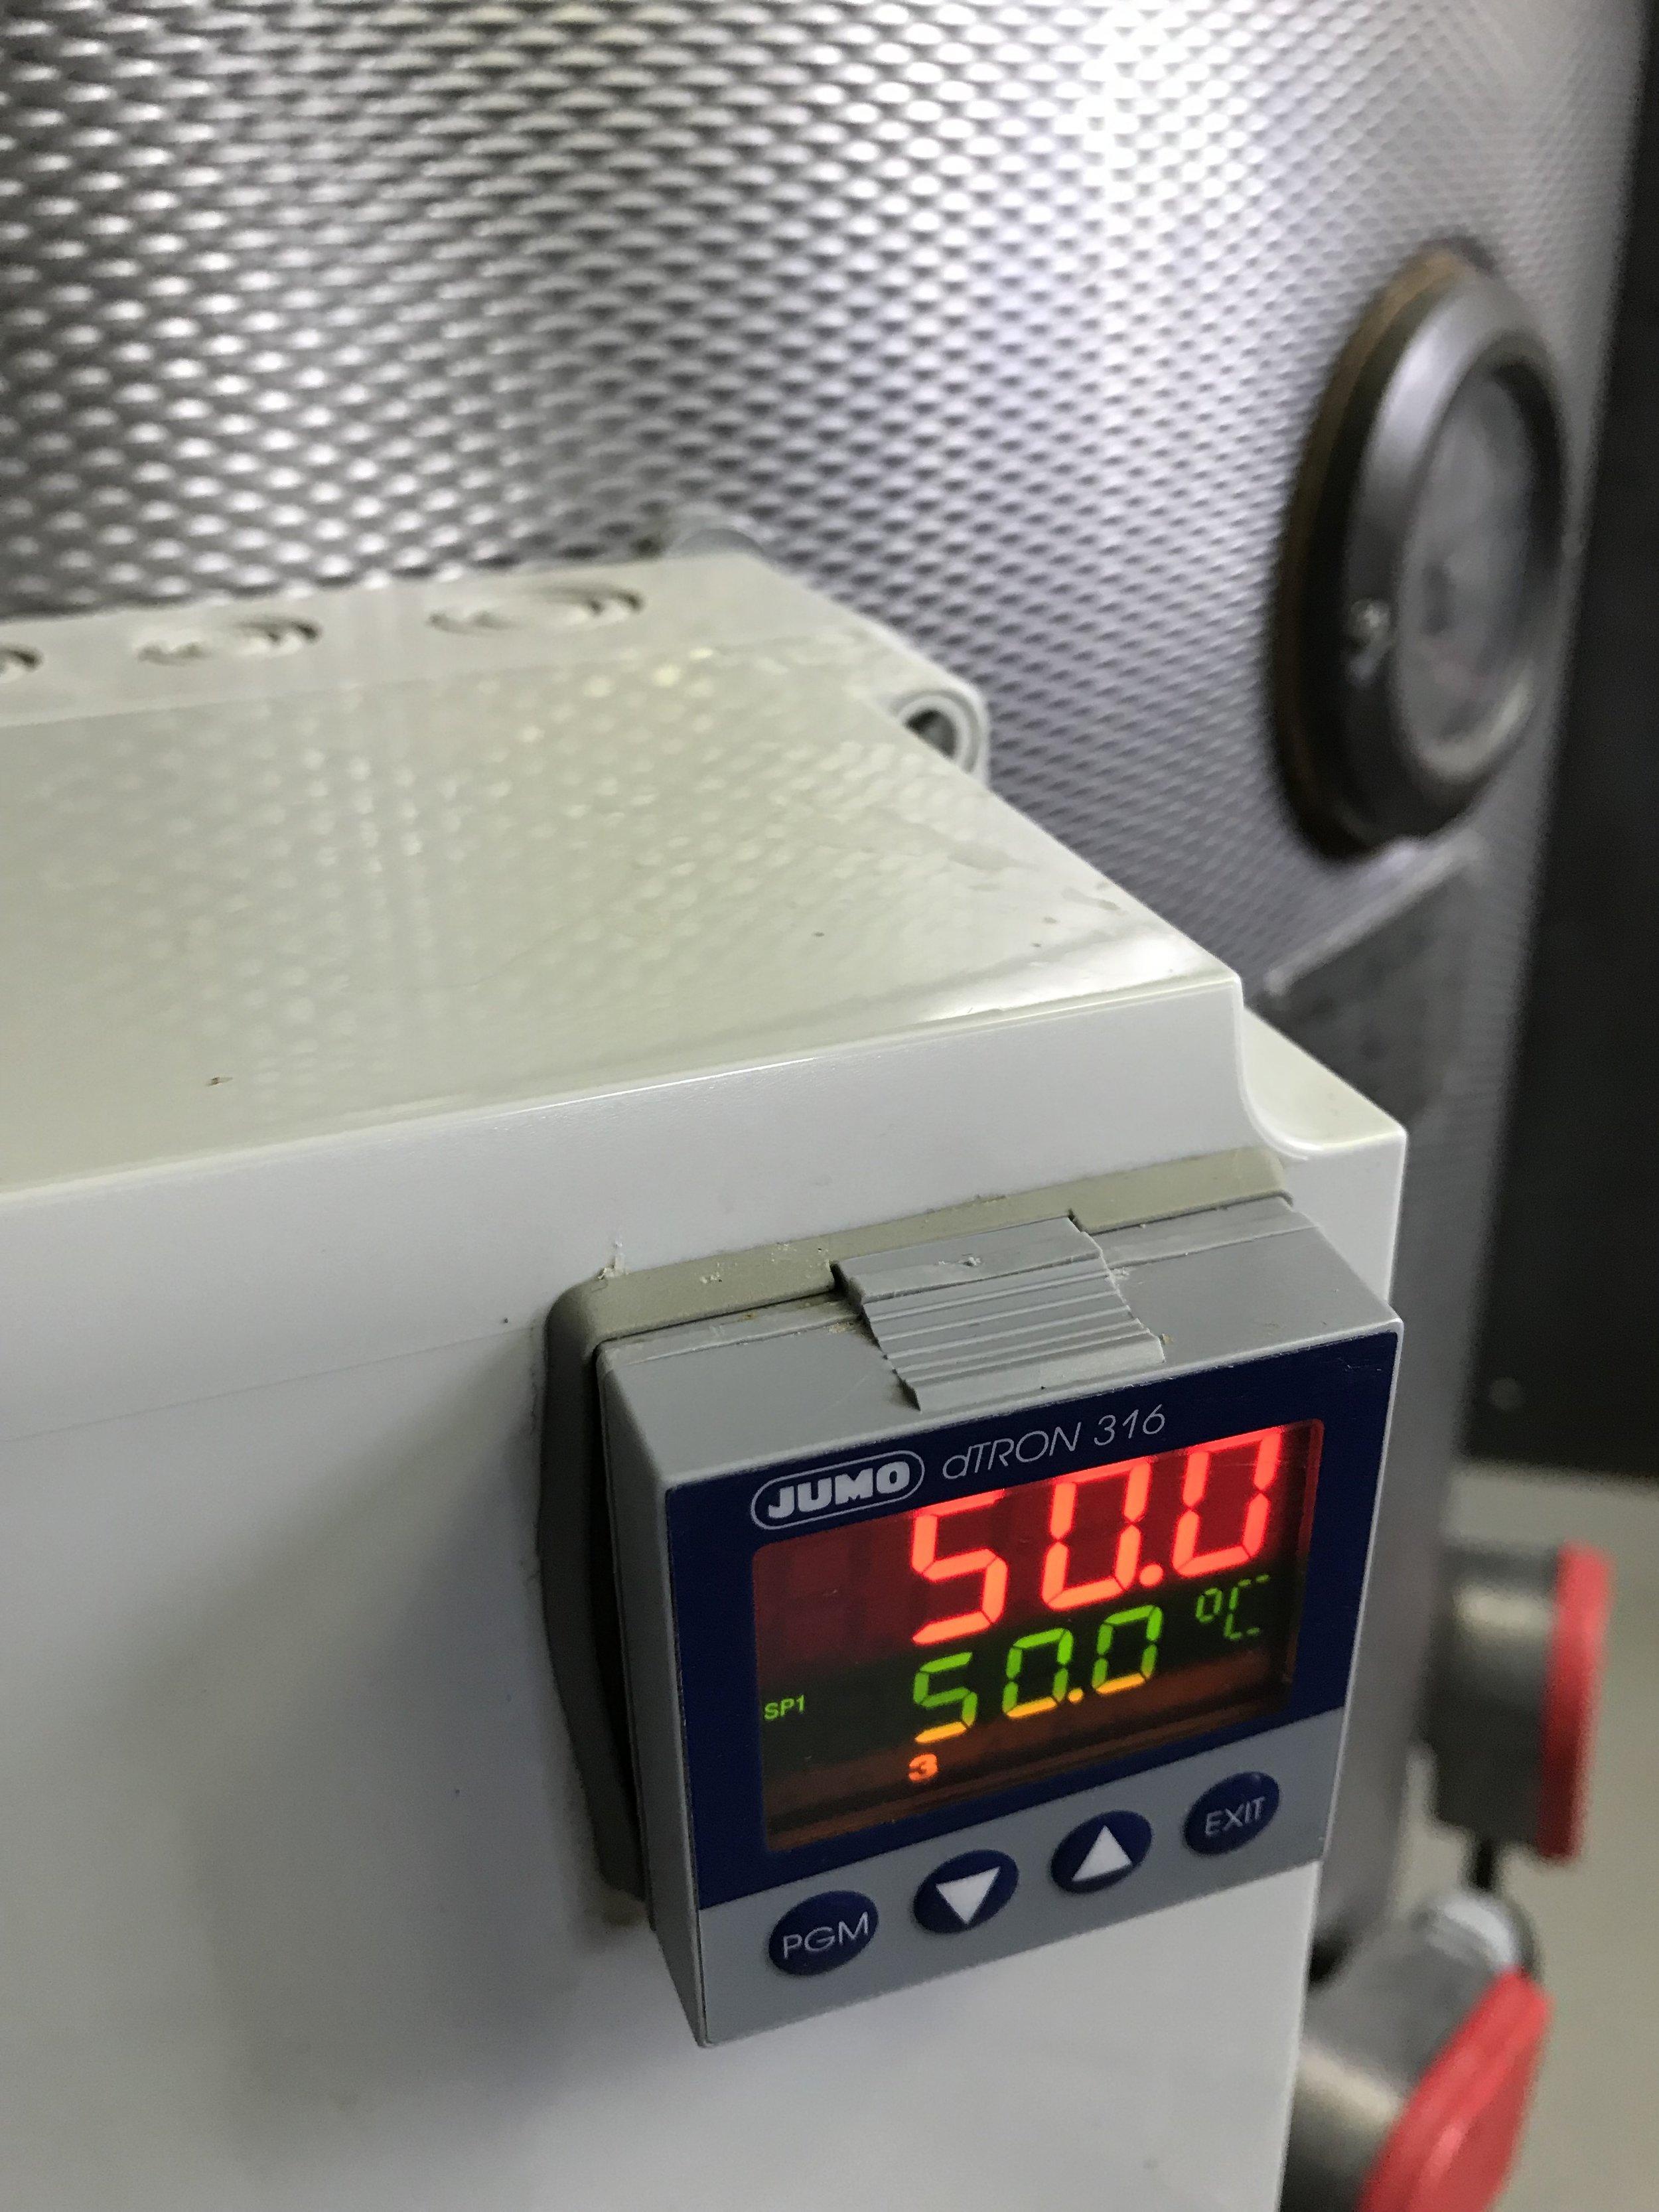 Temperatur styrning - JUMO dTron 316